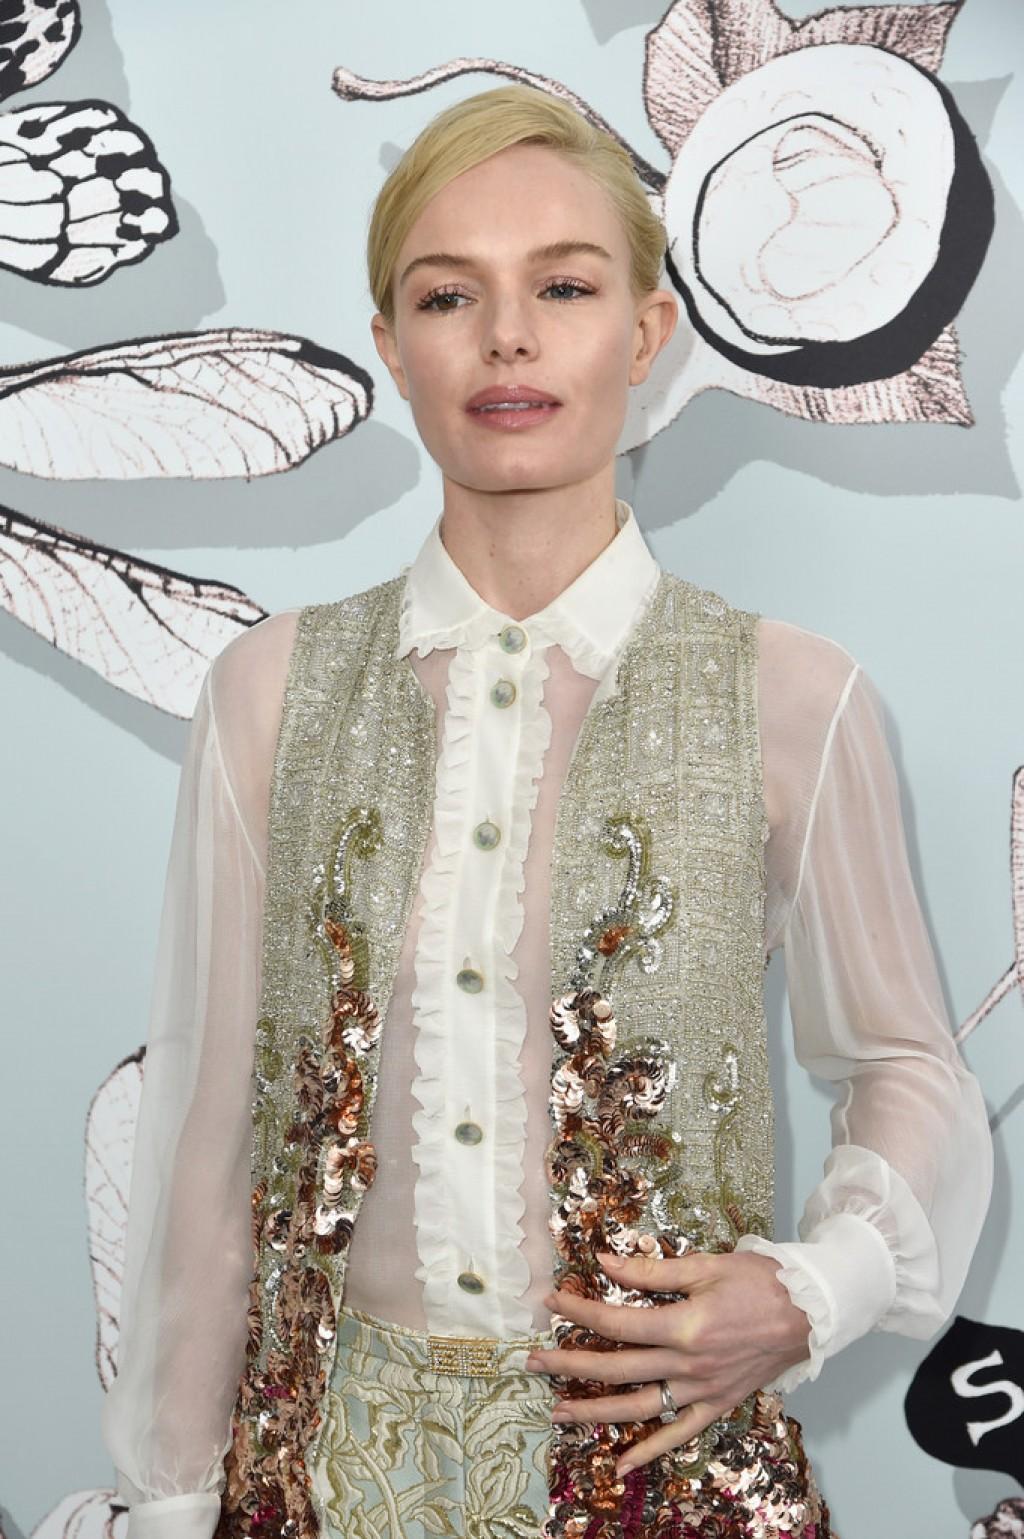 Schiaparelli-Front-Row-Paris-Fashion-Week-Kate-Bosworth-Makeup-1024x1539